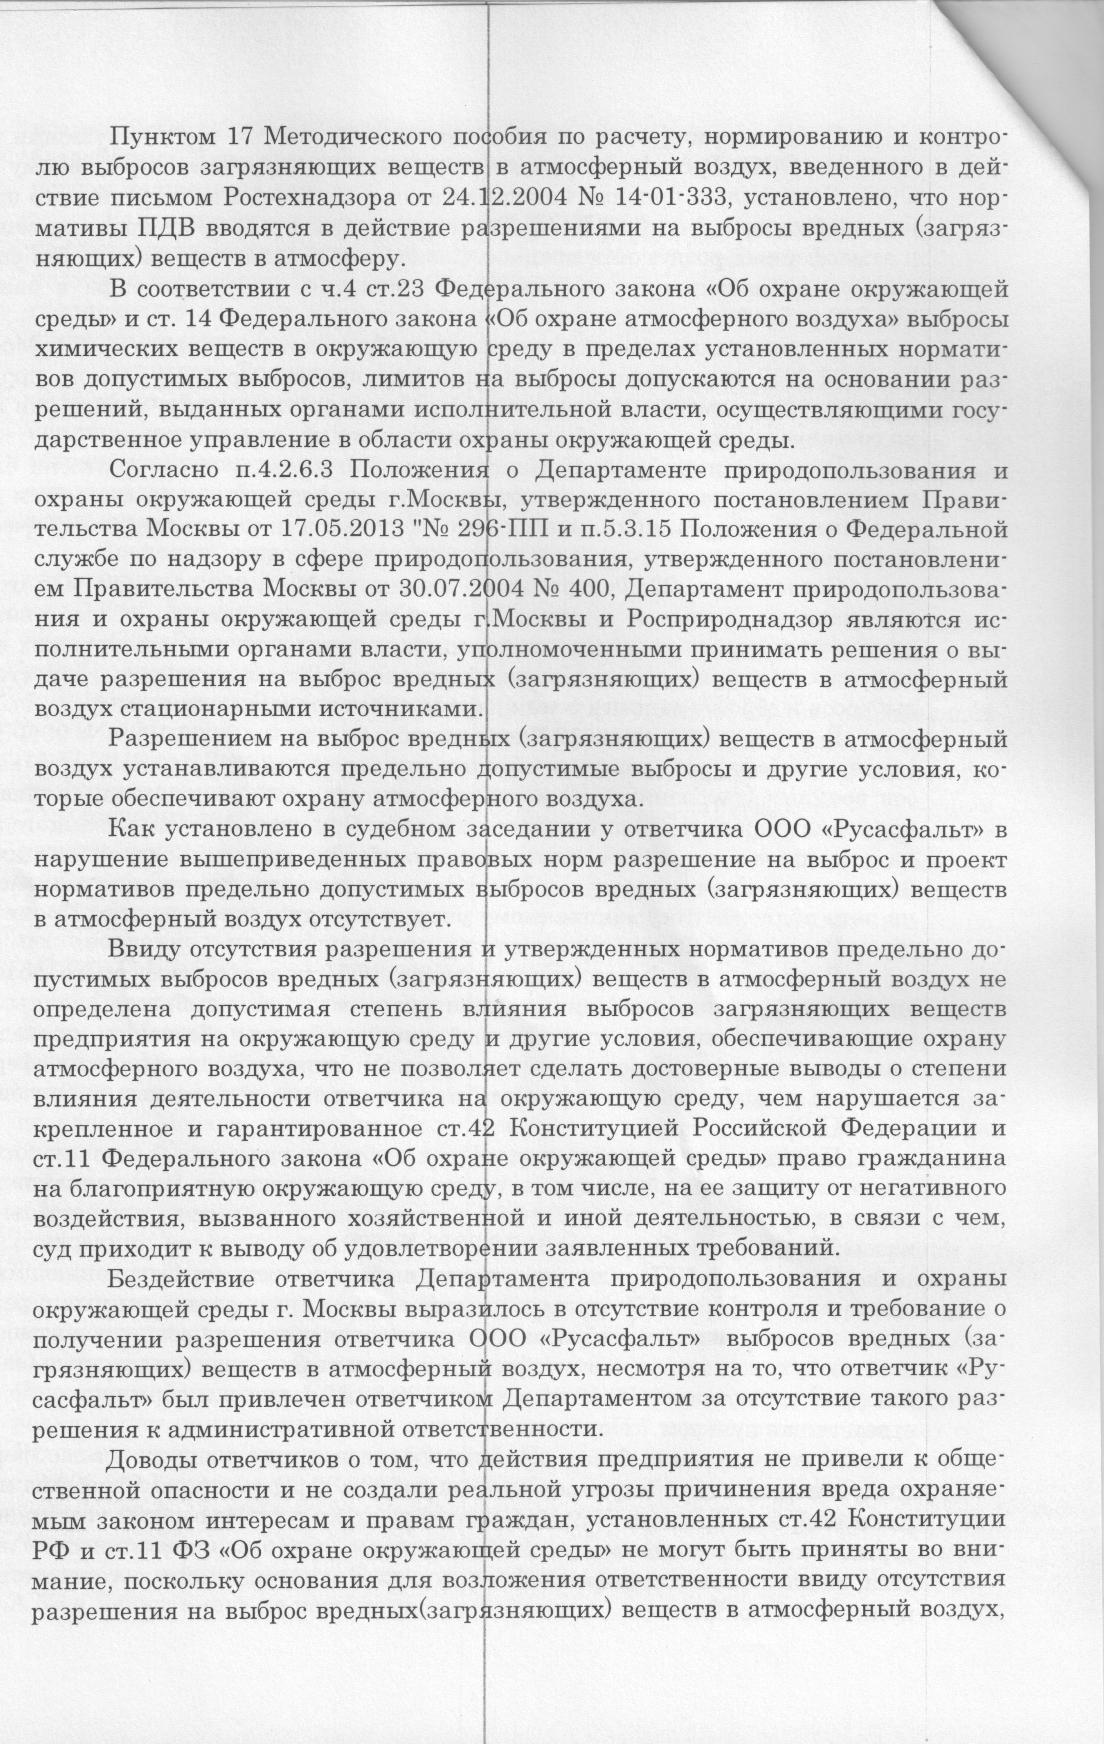 стр. 4